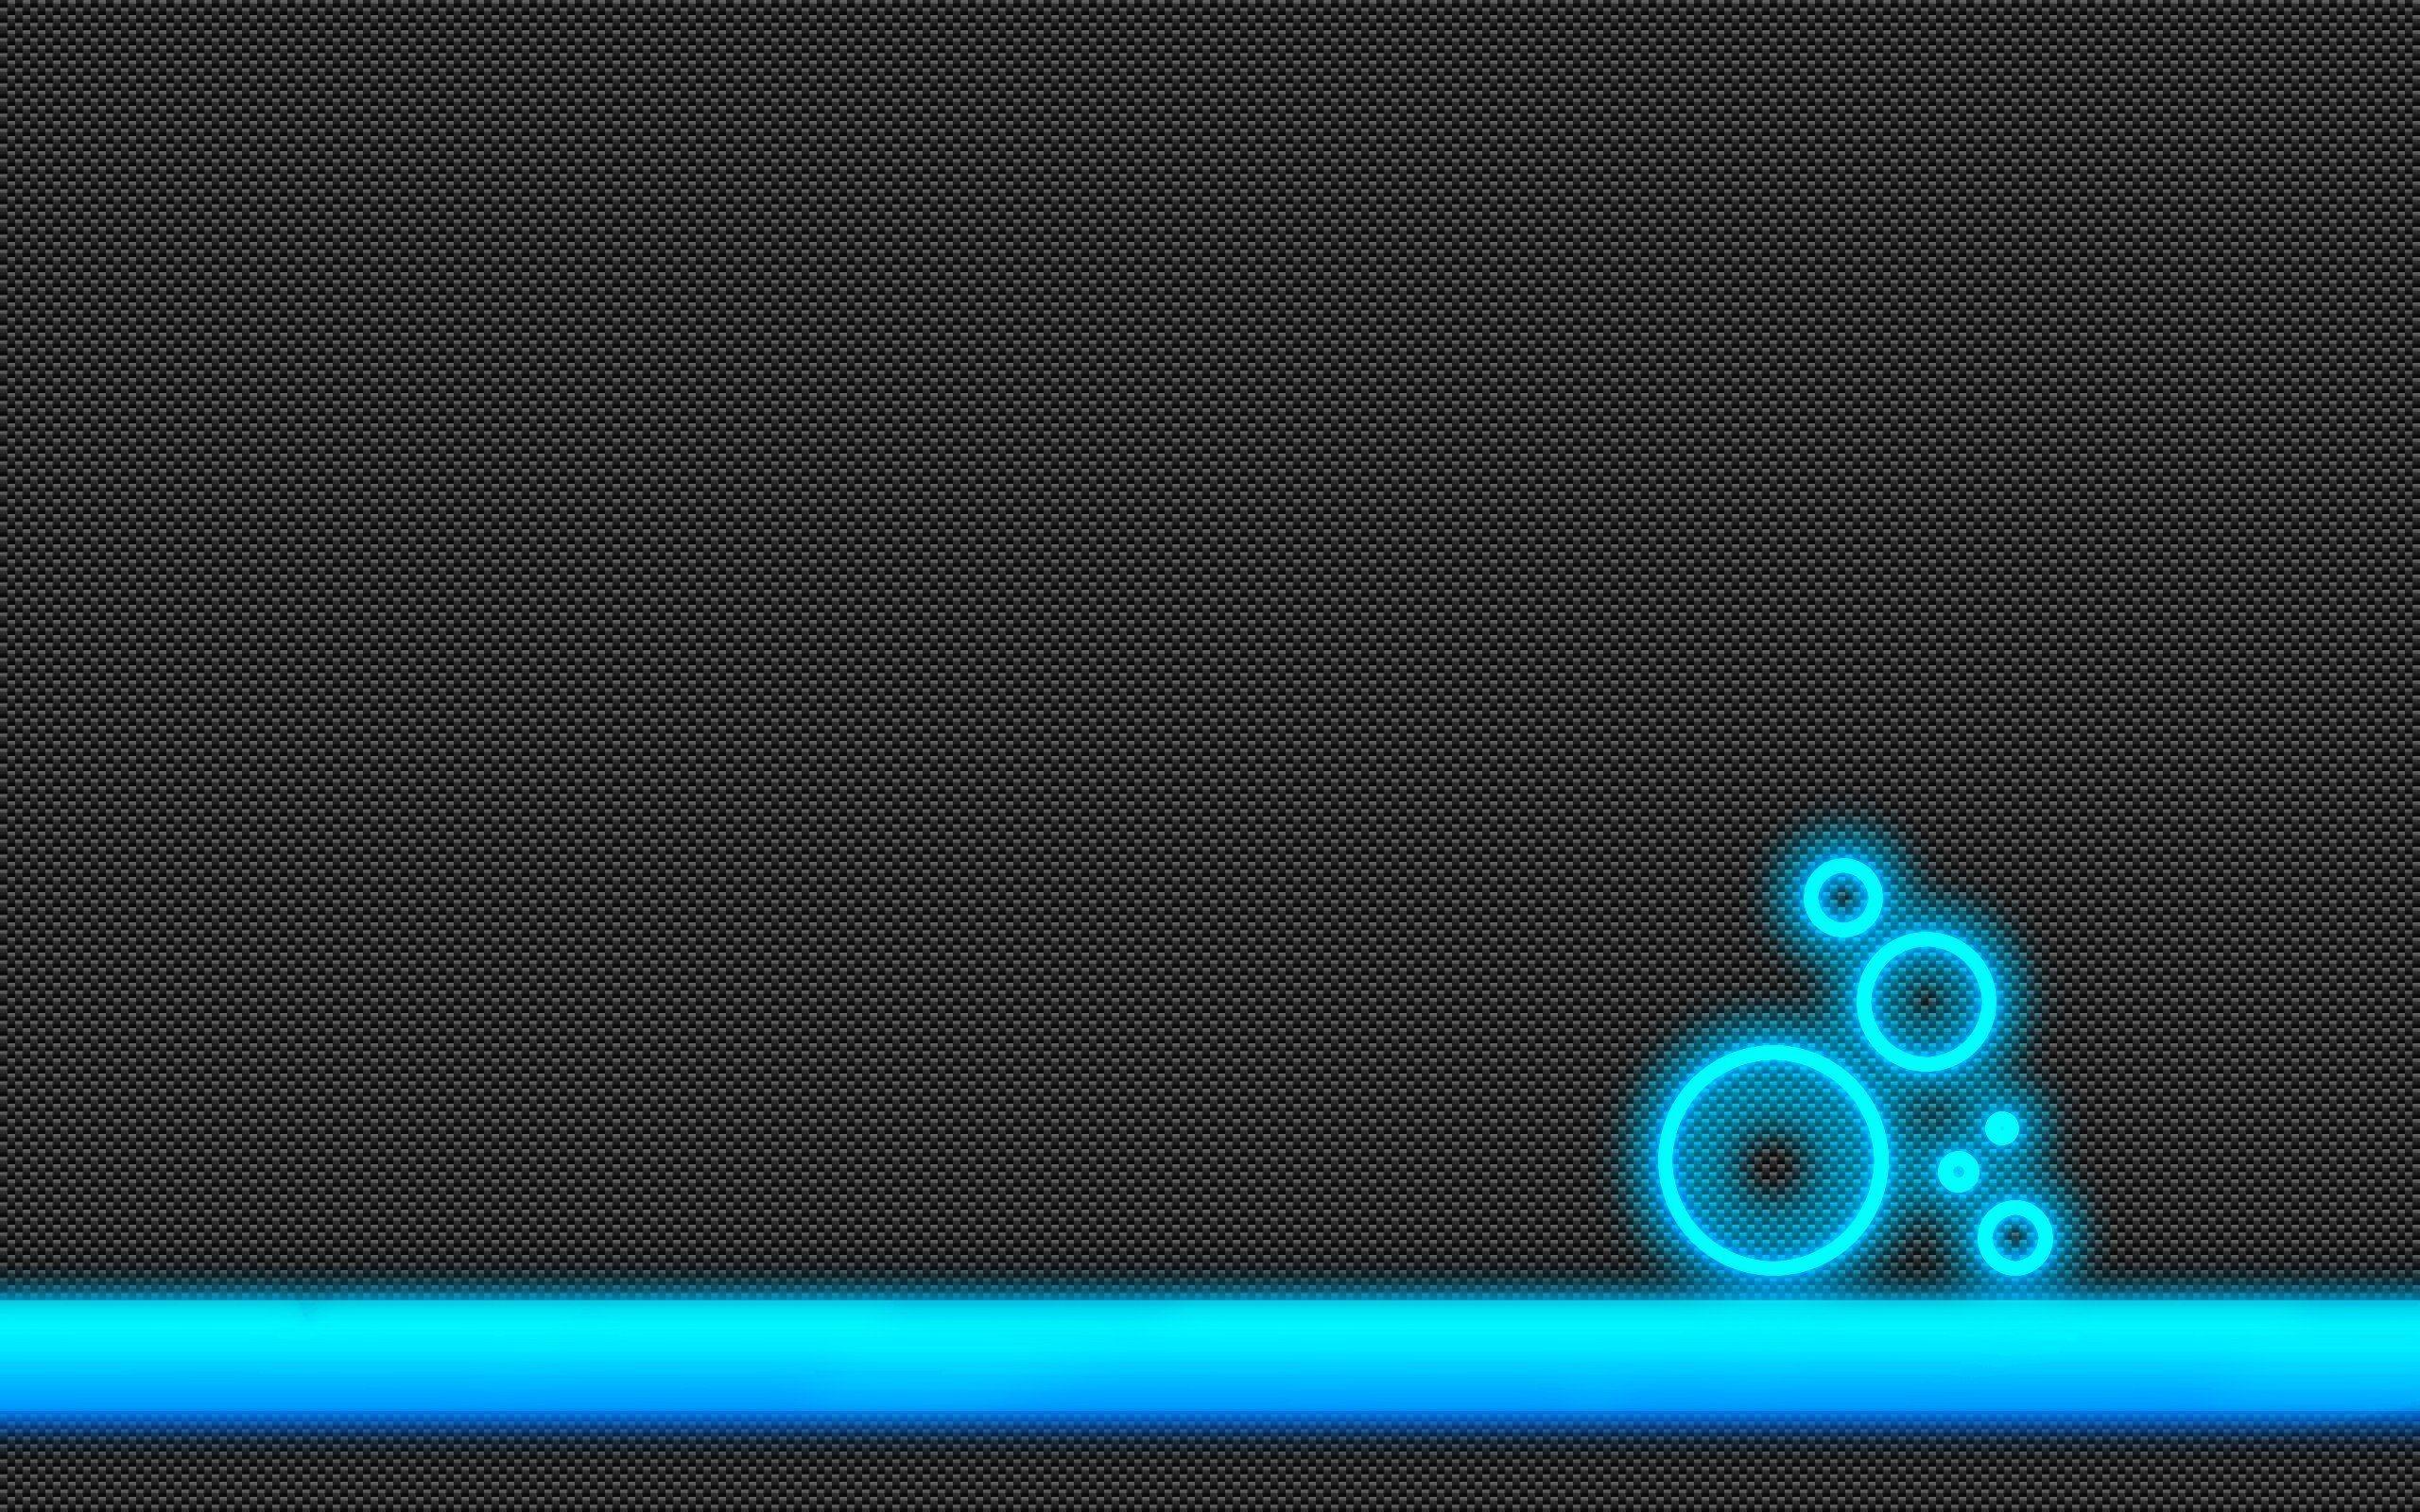 Carbon Fibre HD by gnu32 on DeviantArt